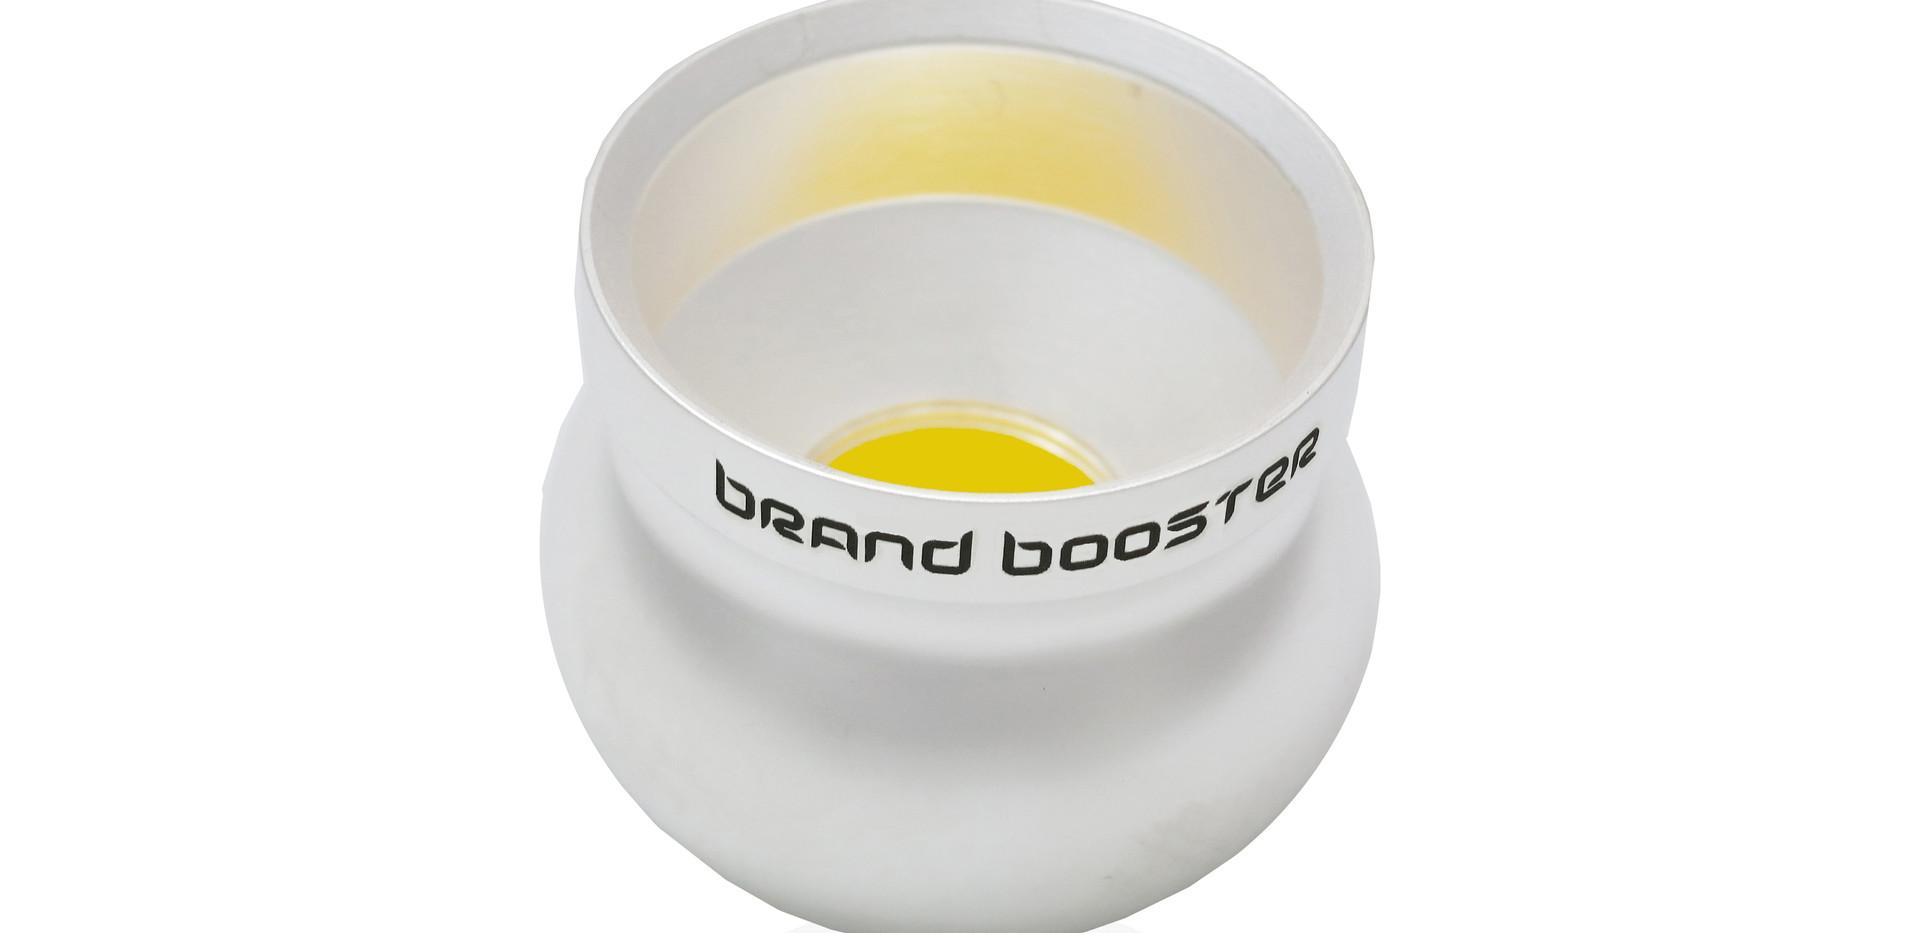 tb Brand Booster silver satin.jpg